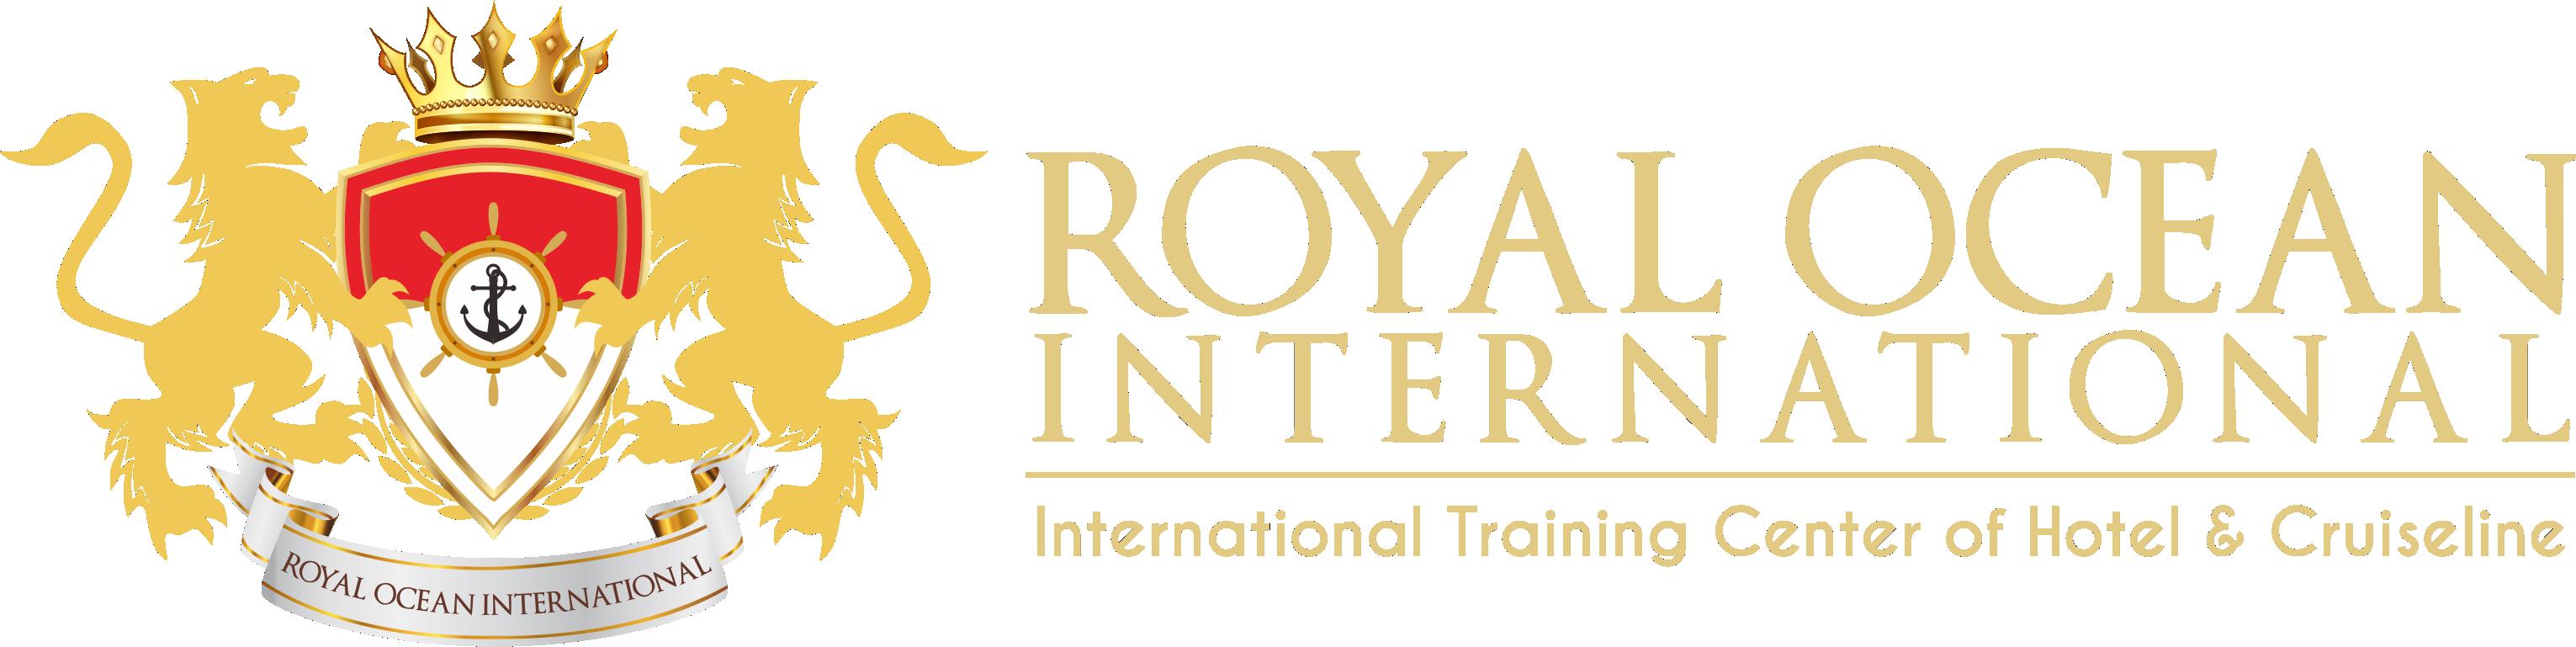 Royal Ocean International